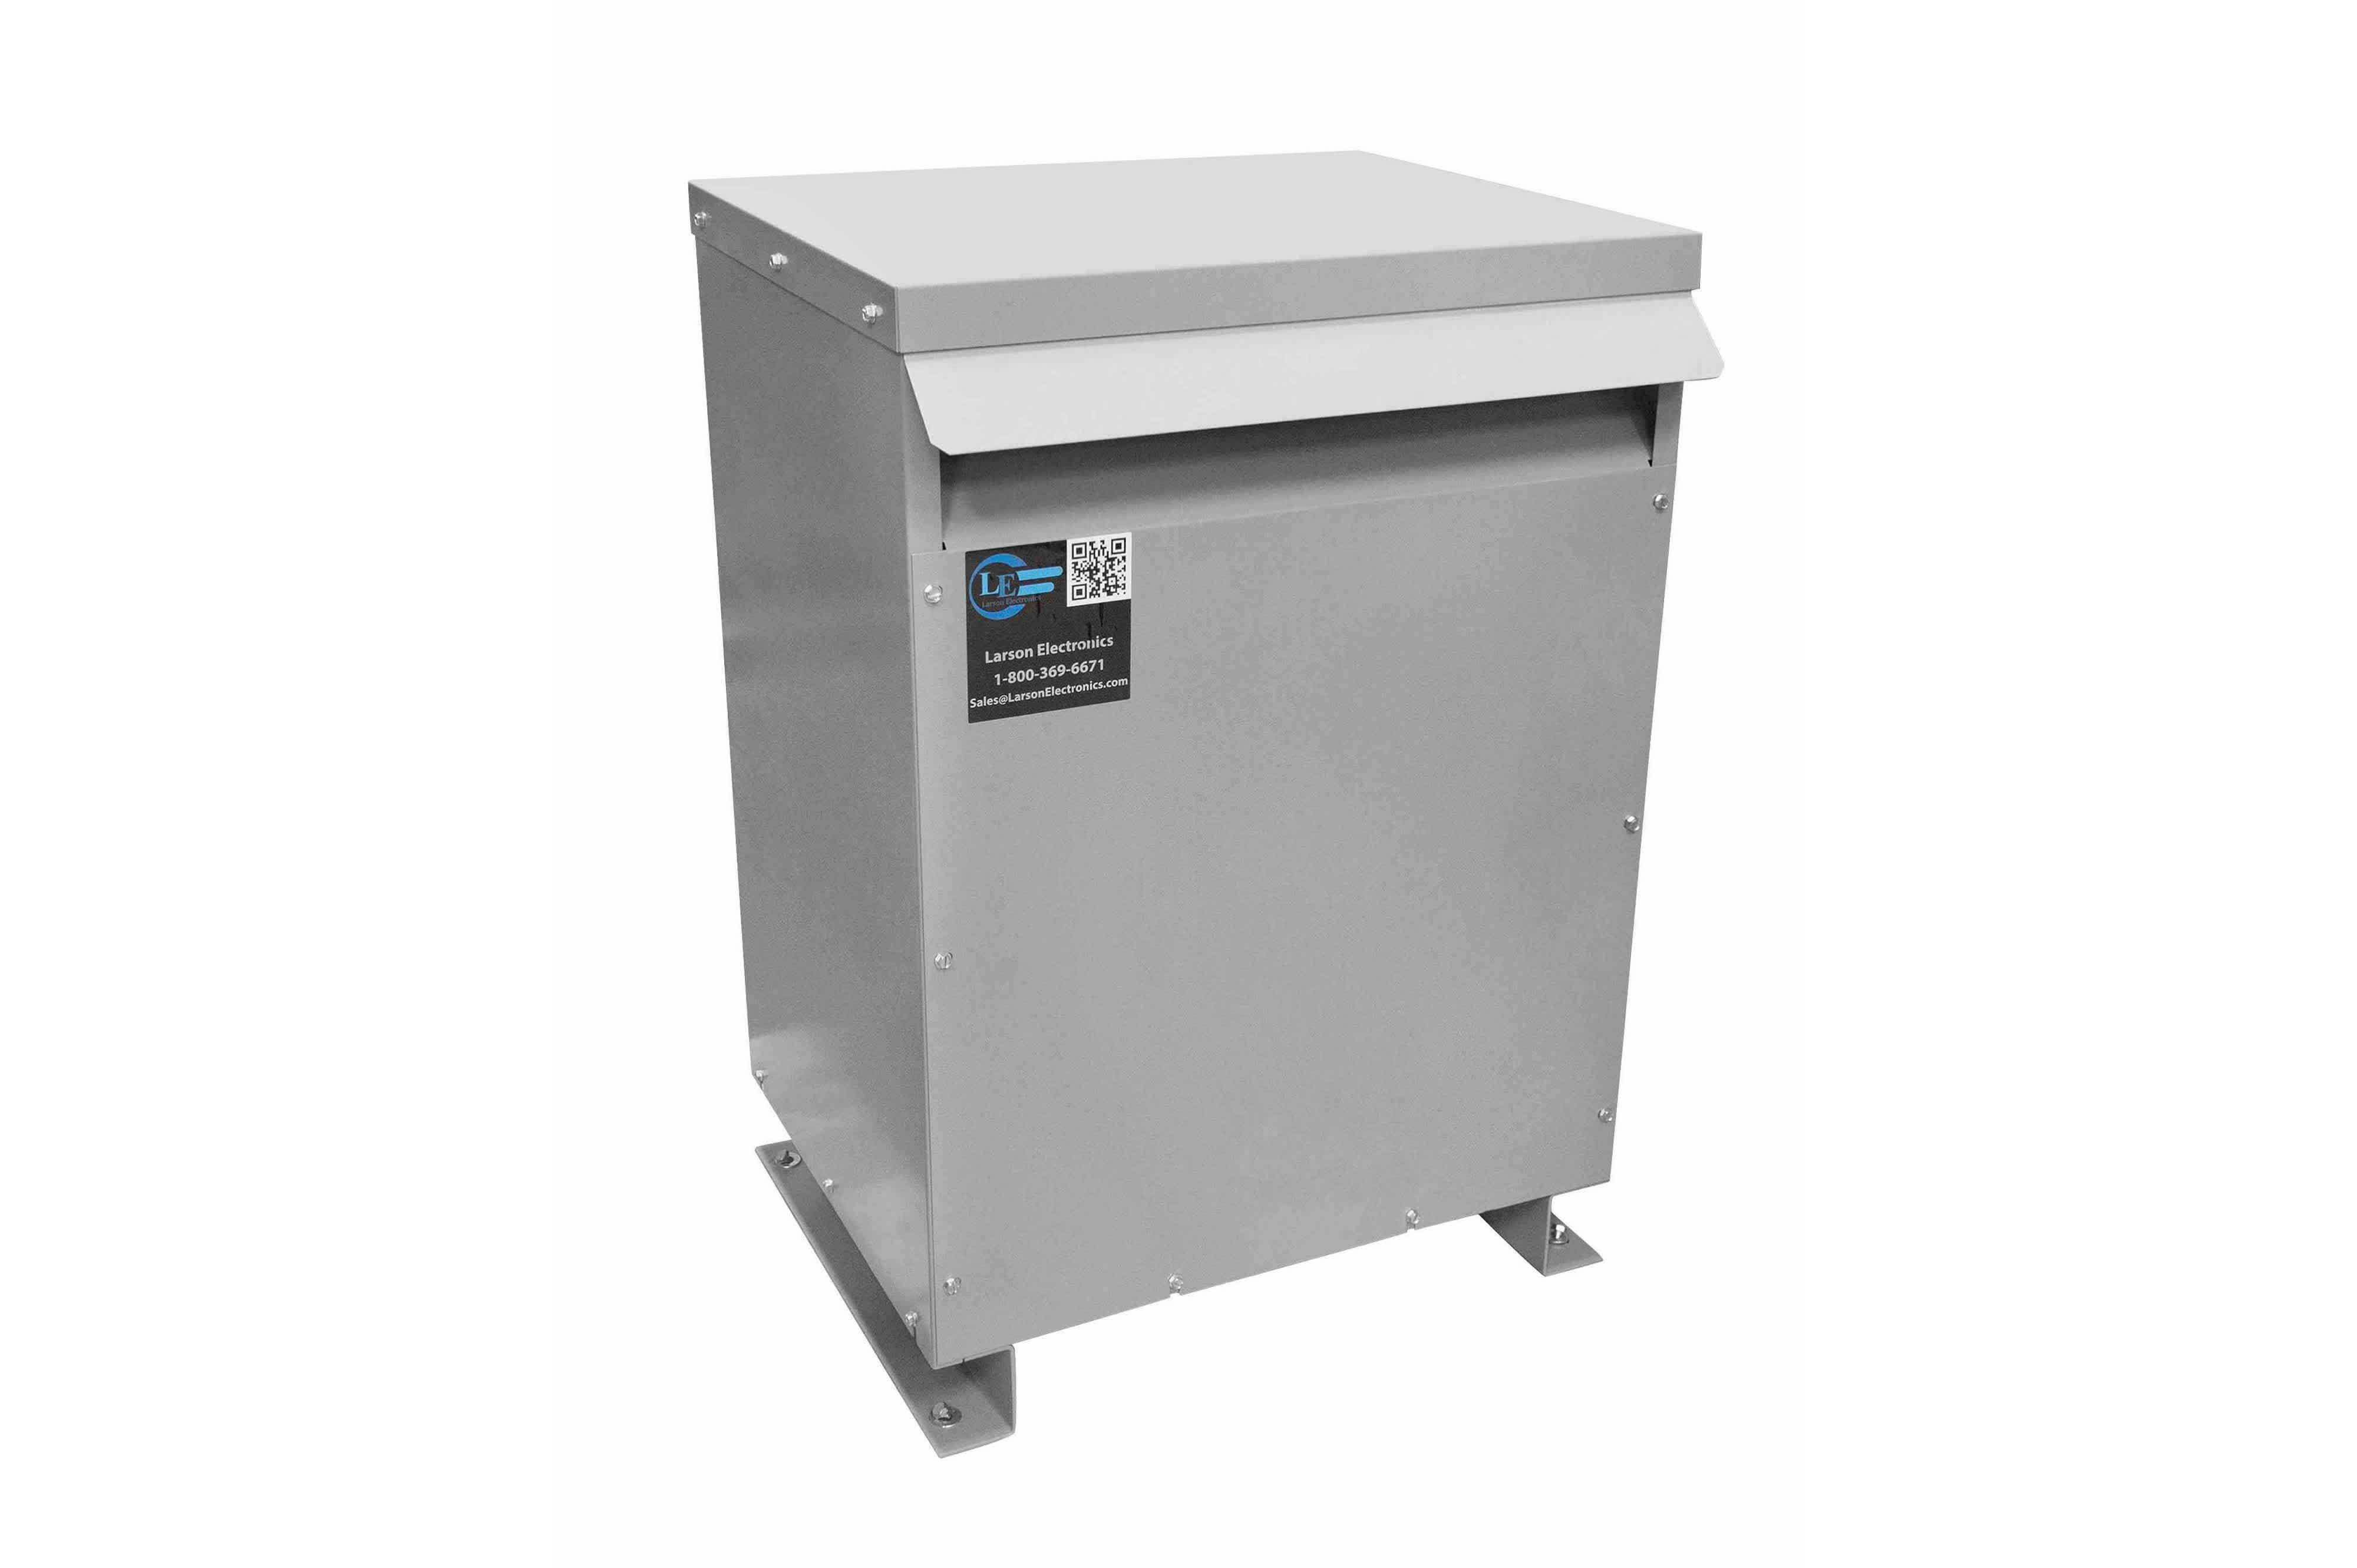 18 kVA 3PH Isolation Transformer, 415V Wye Primary, 240V/120 Delta Secondary, N3R, Ventilated, 60 Hz